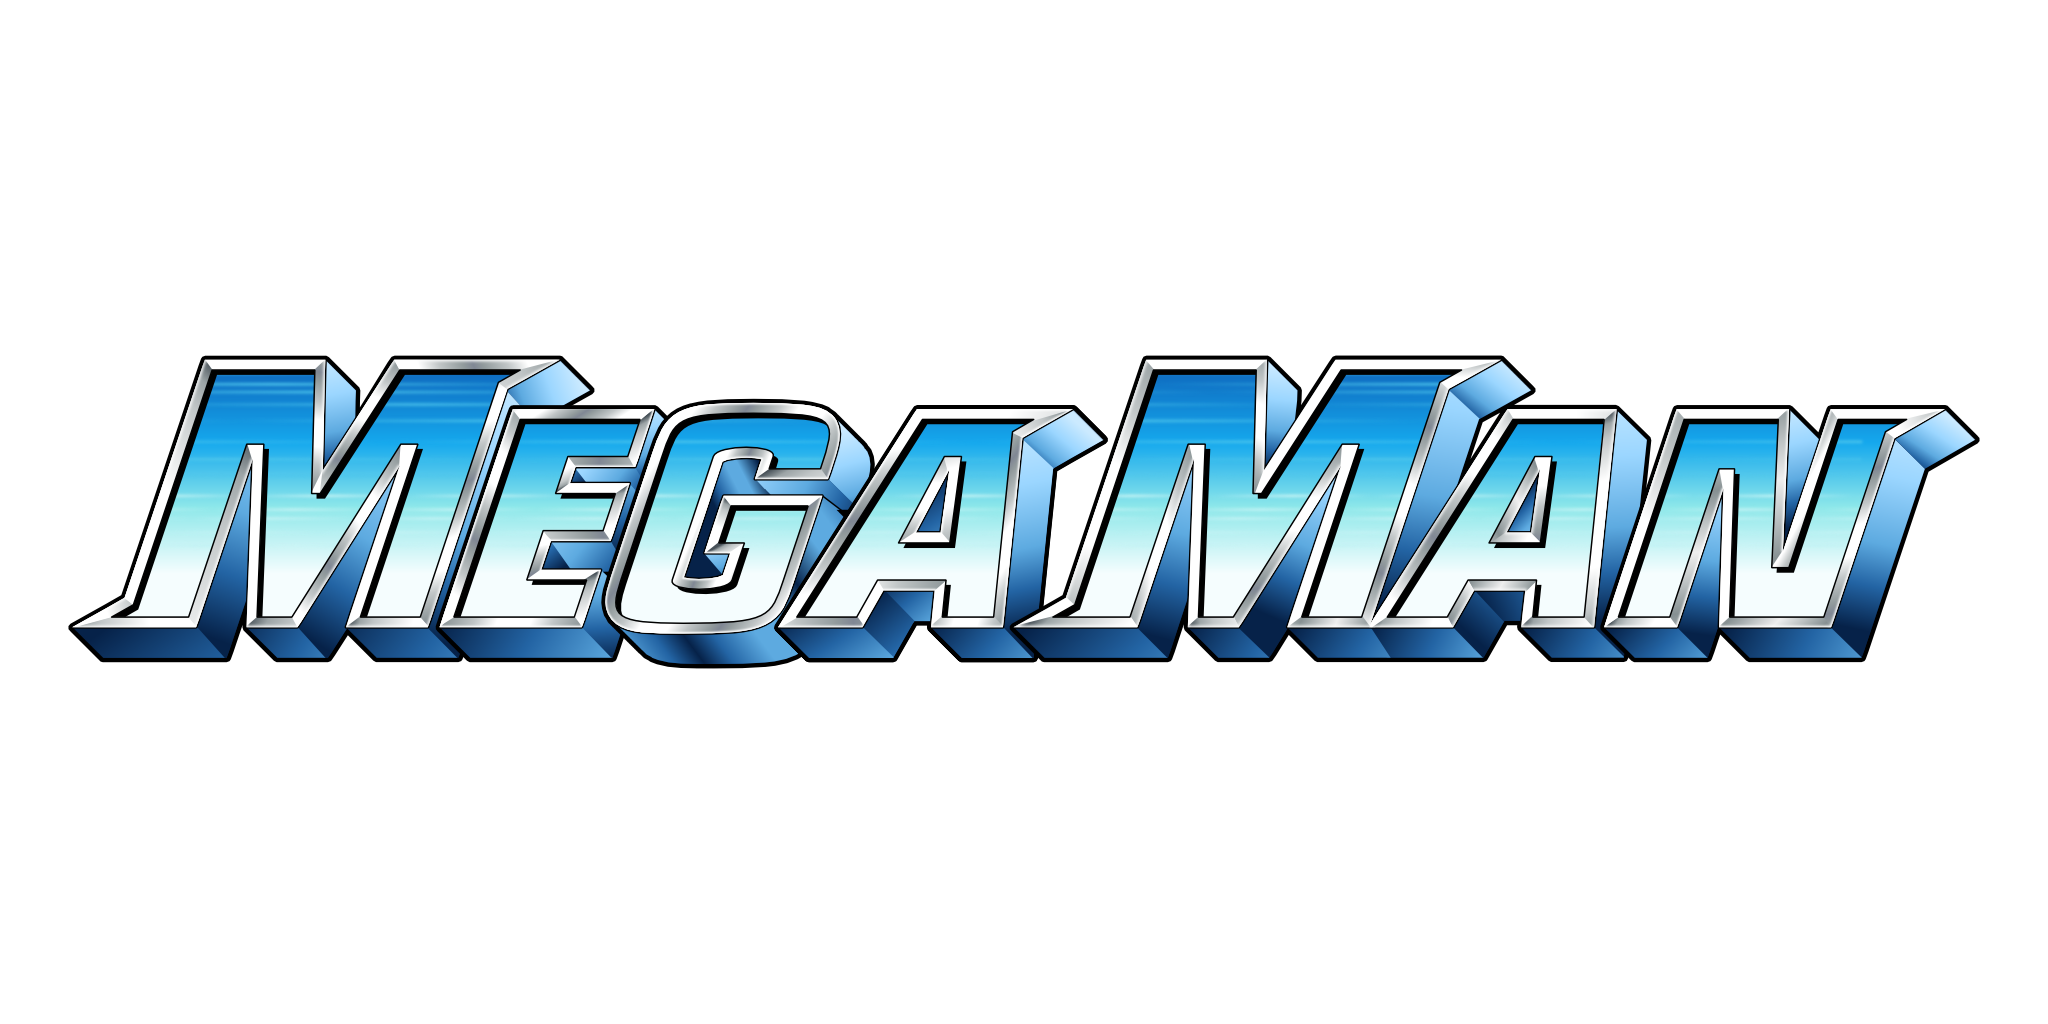 Image mmkb the mega man - Megaman wikia ...